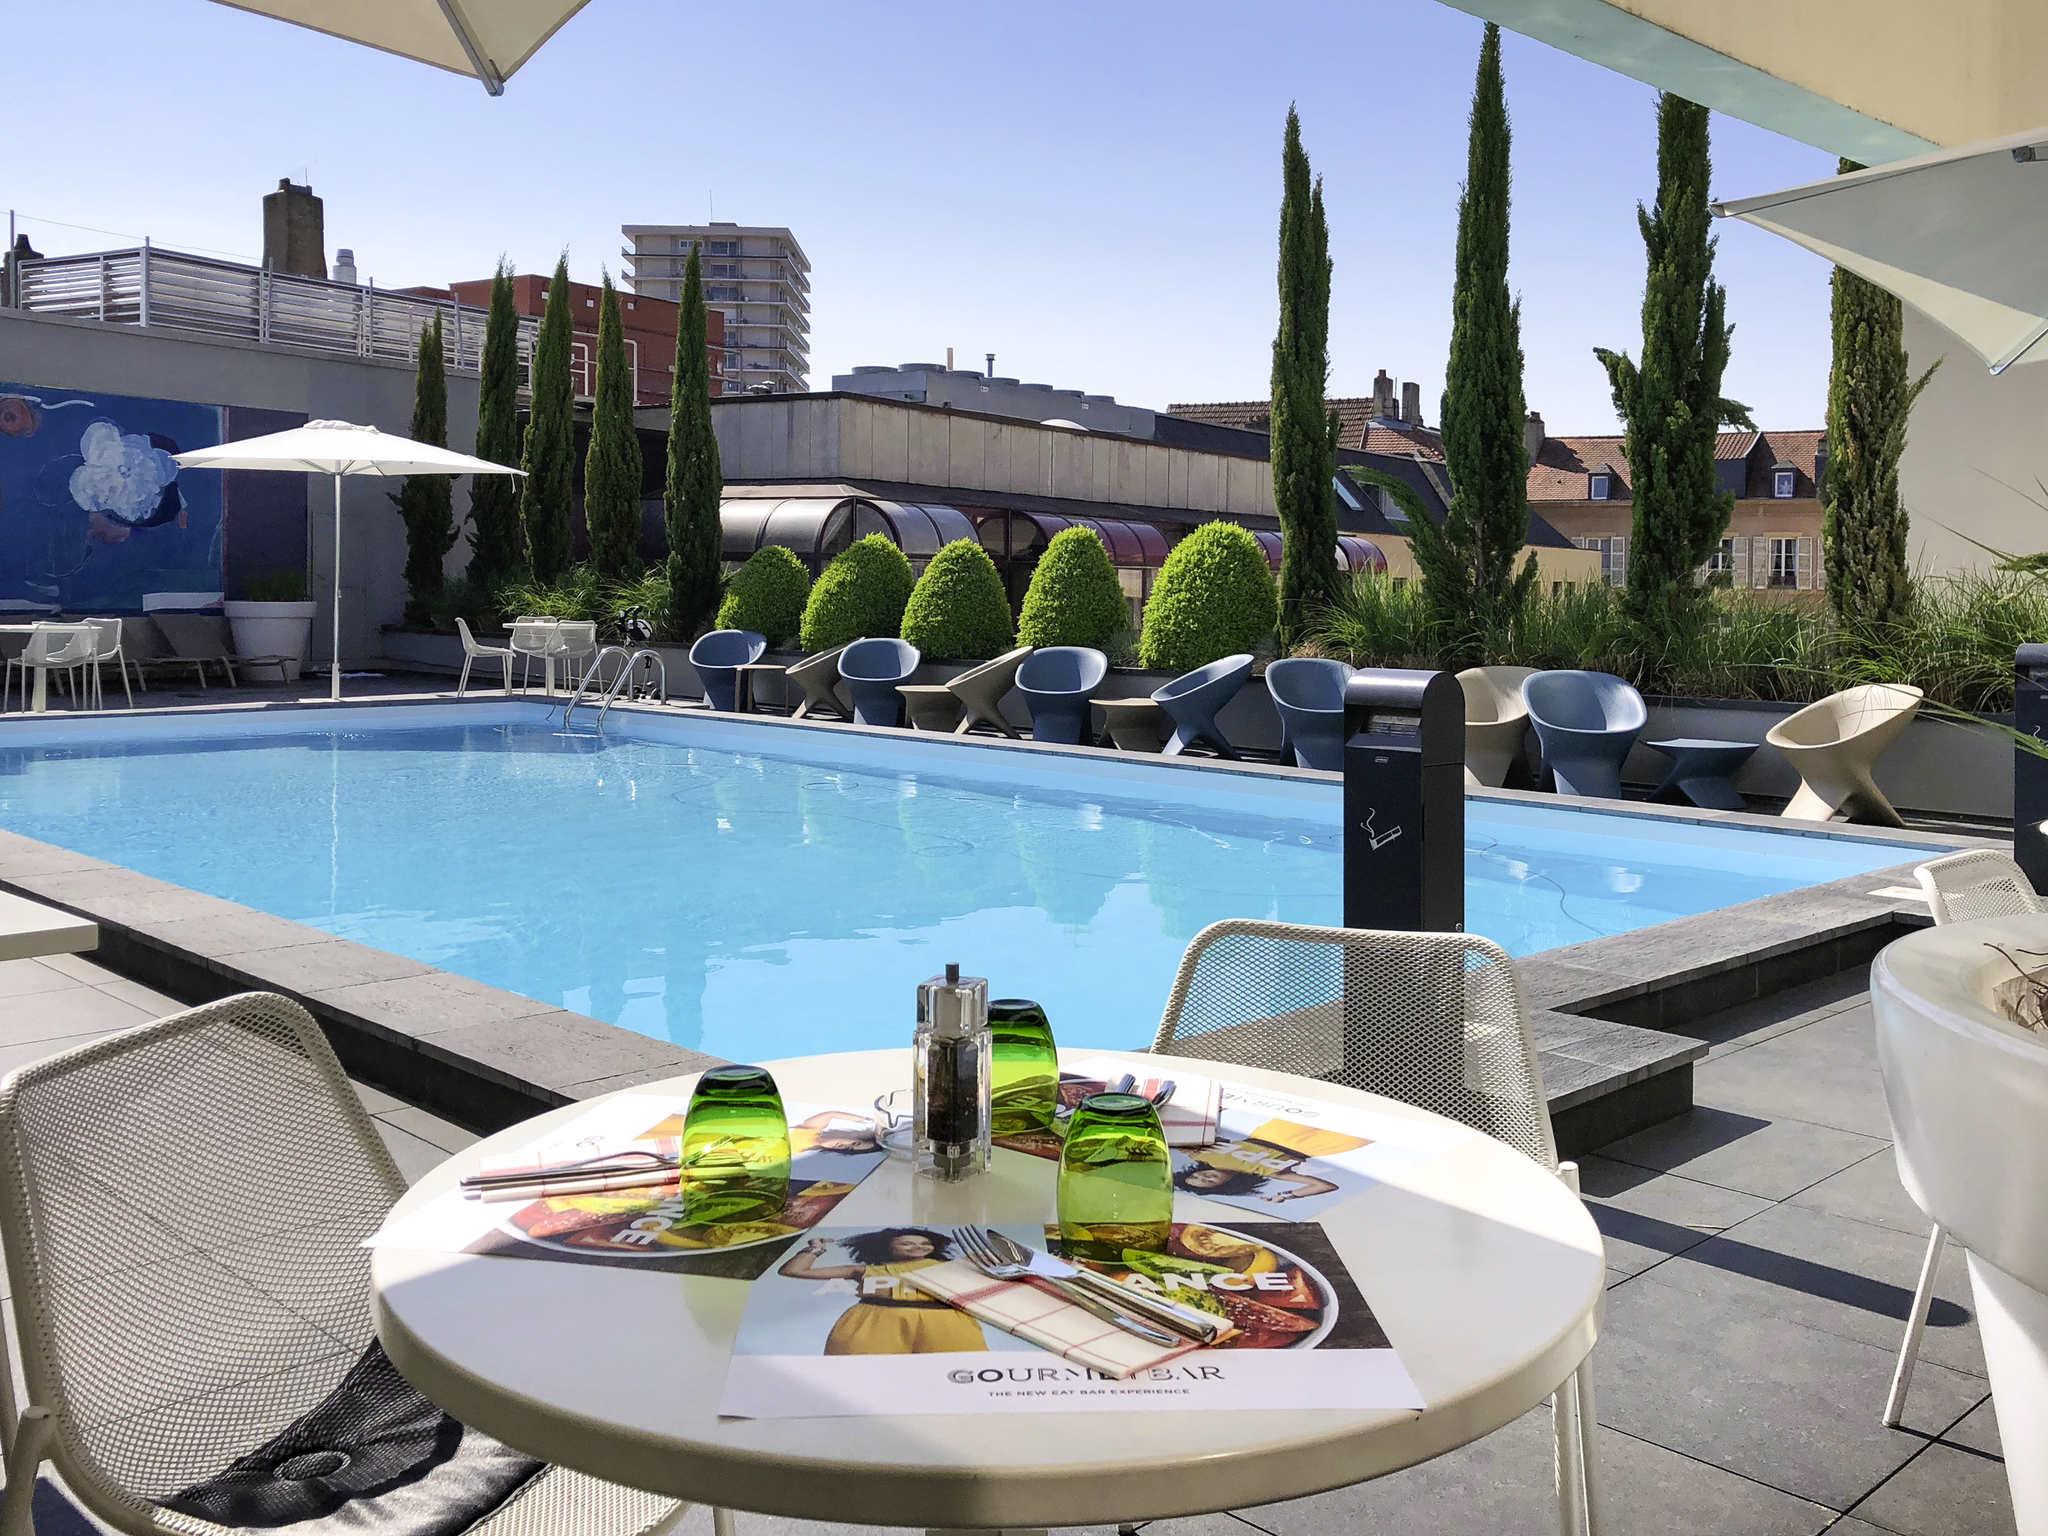 Hotel - Novotel Metz Centre